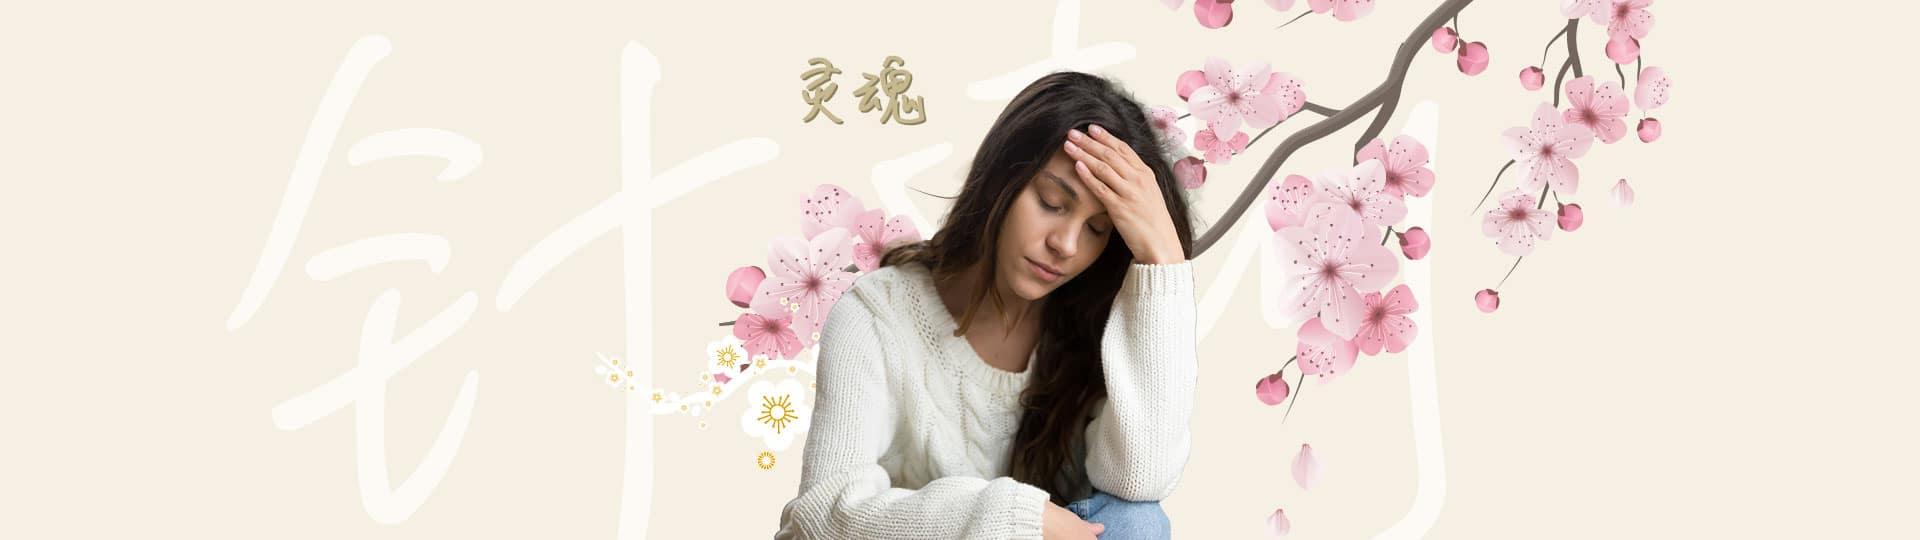 דיכאון טיפול טבעי דיקור סיני